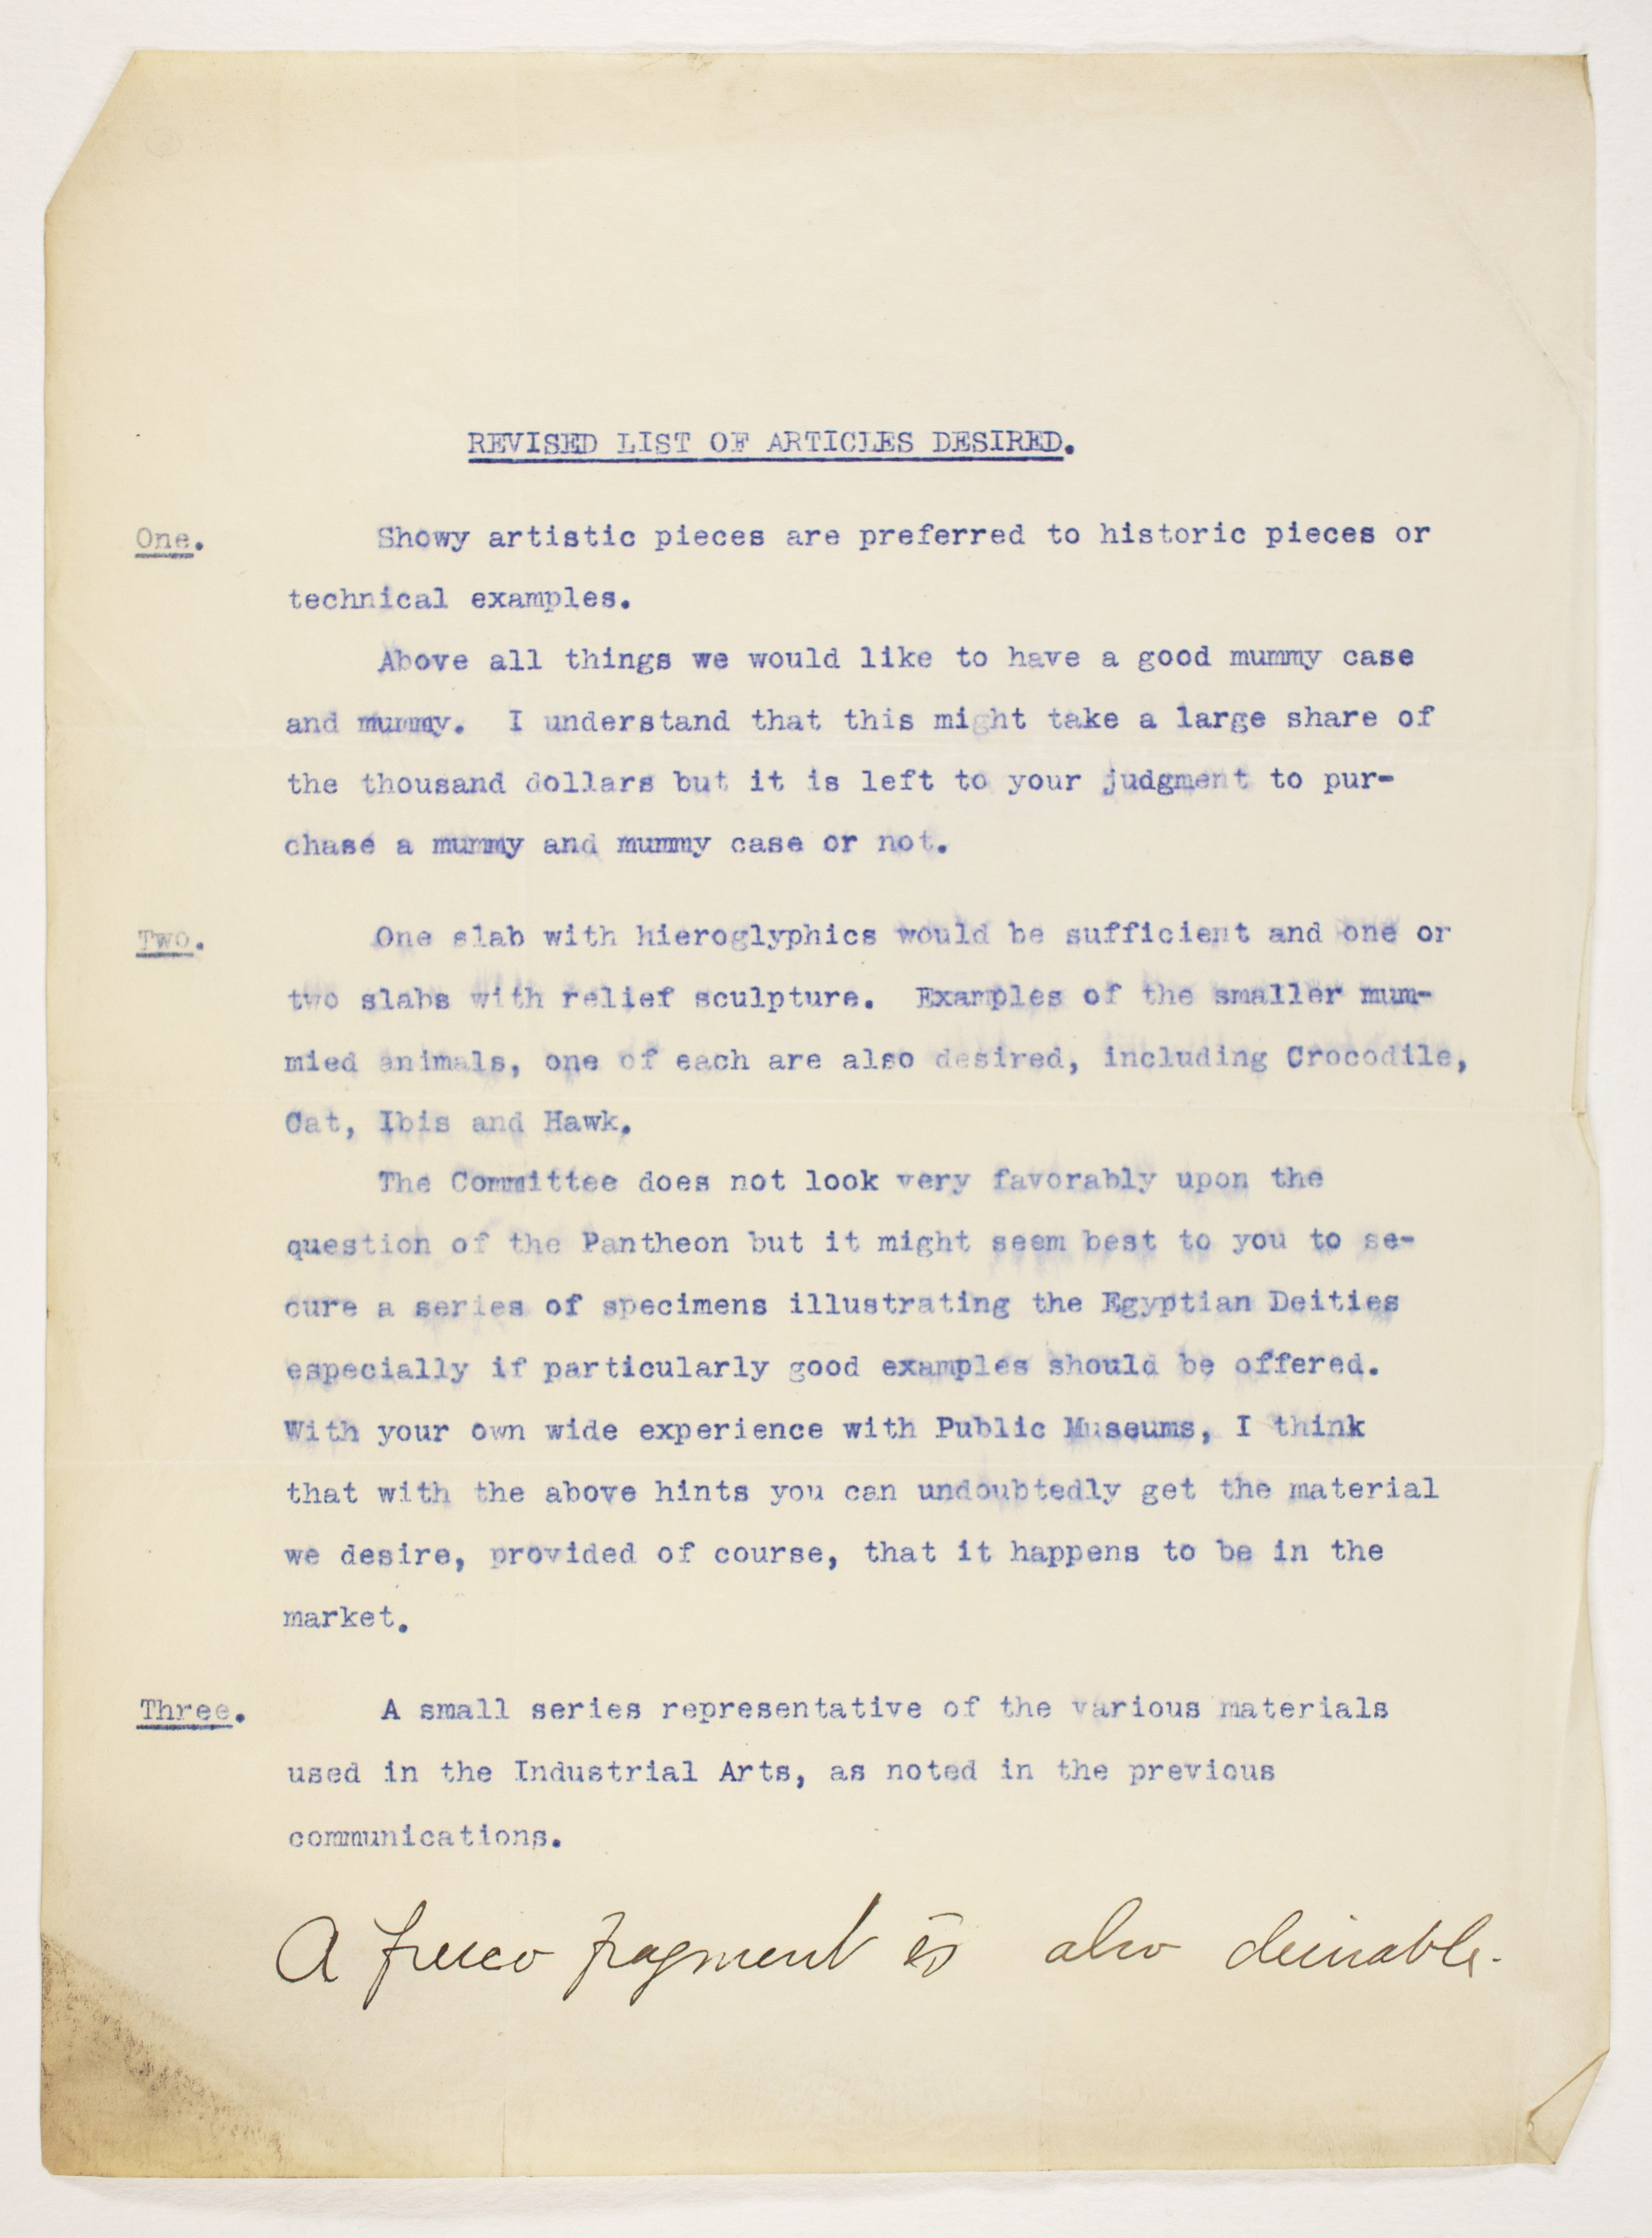 1904-05 Saqqara, Serabit el-Khadim, Sinai, Magharah, Sinai Correspondence PMA/WFP1/D/13/8